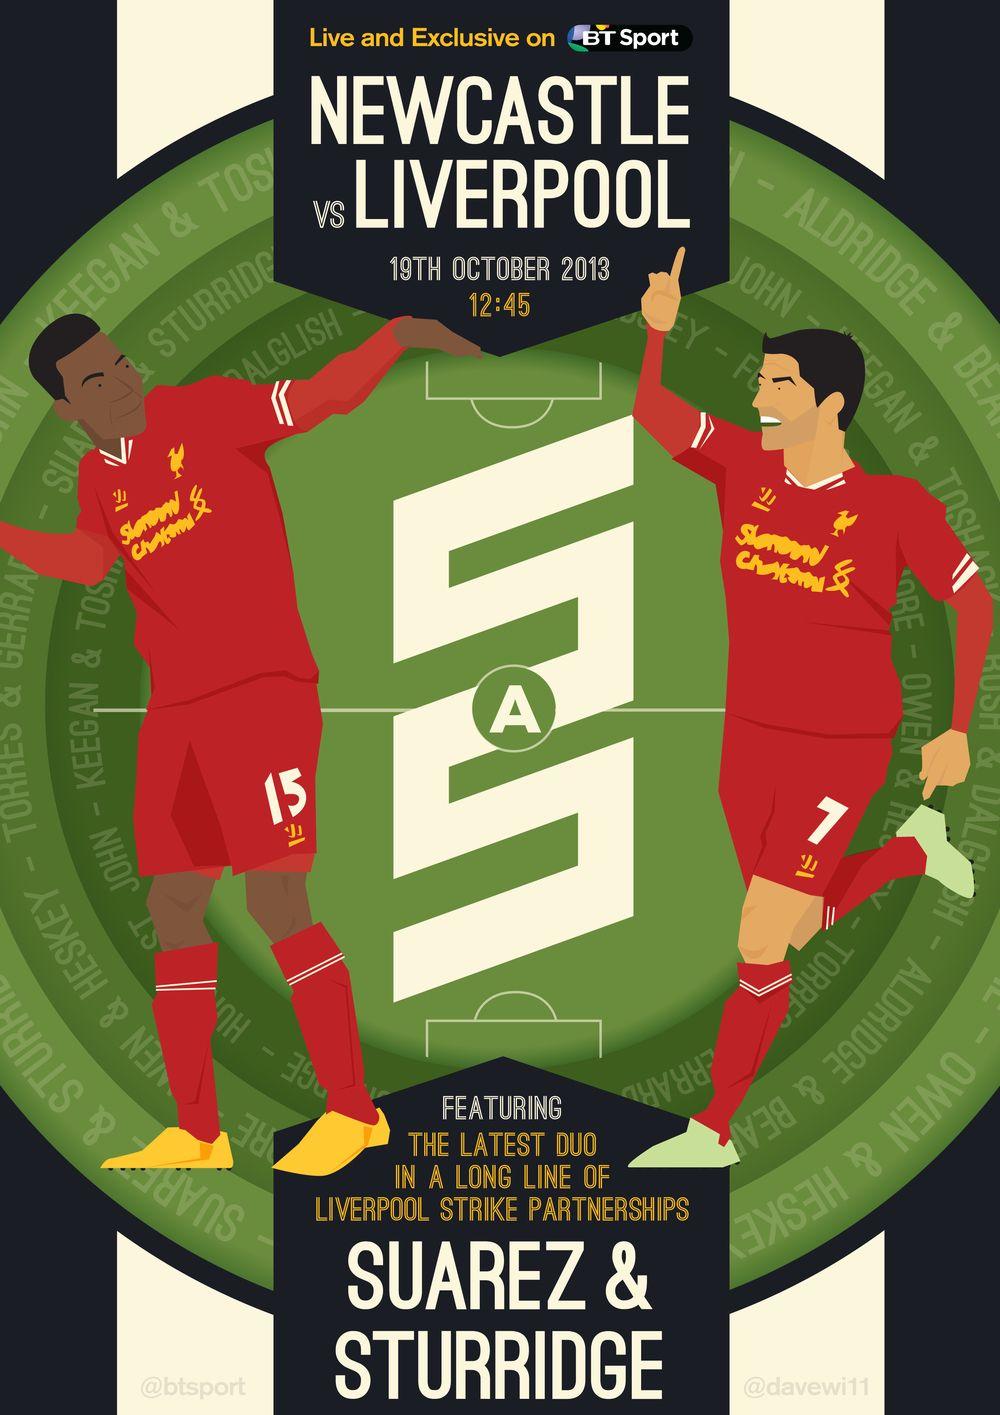 NEWCASTLE v LIVERPOOL Poster.jpg Liverpool football club